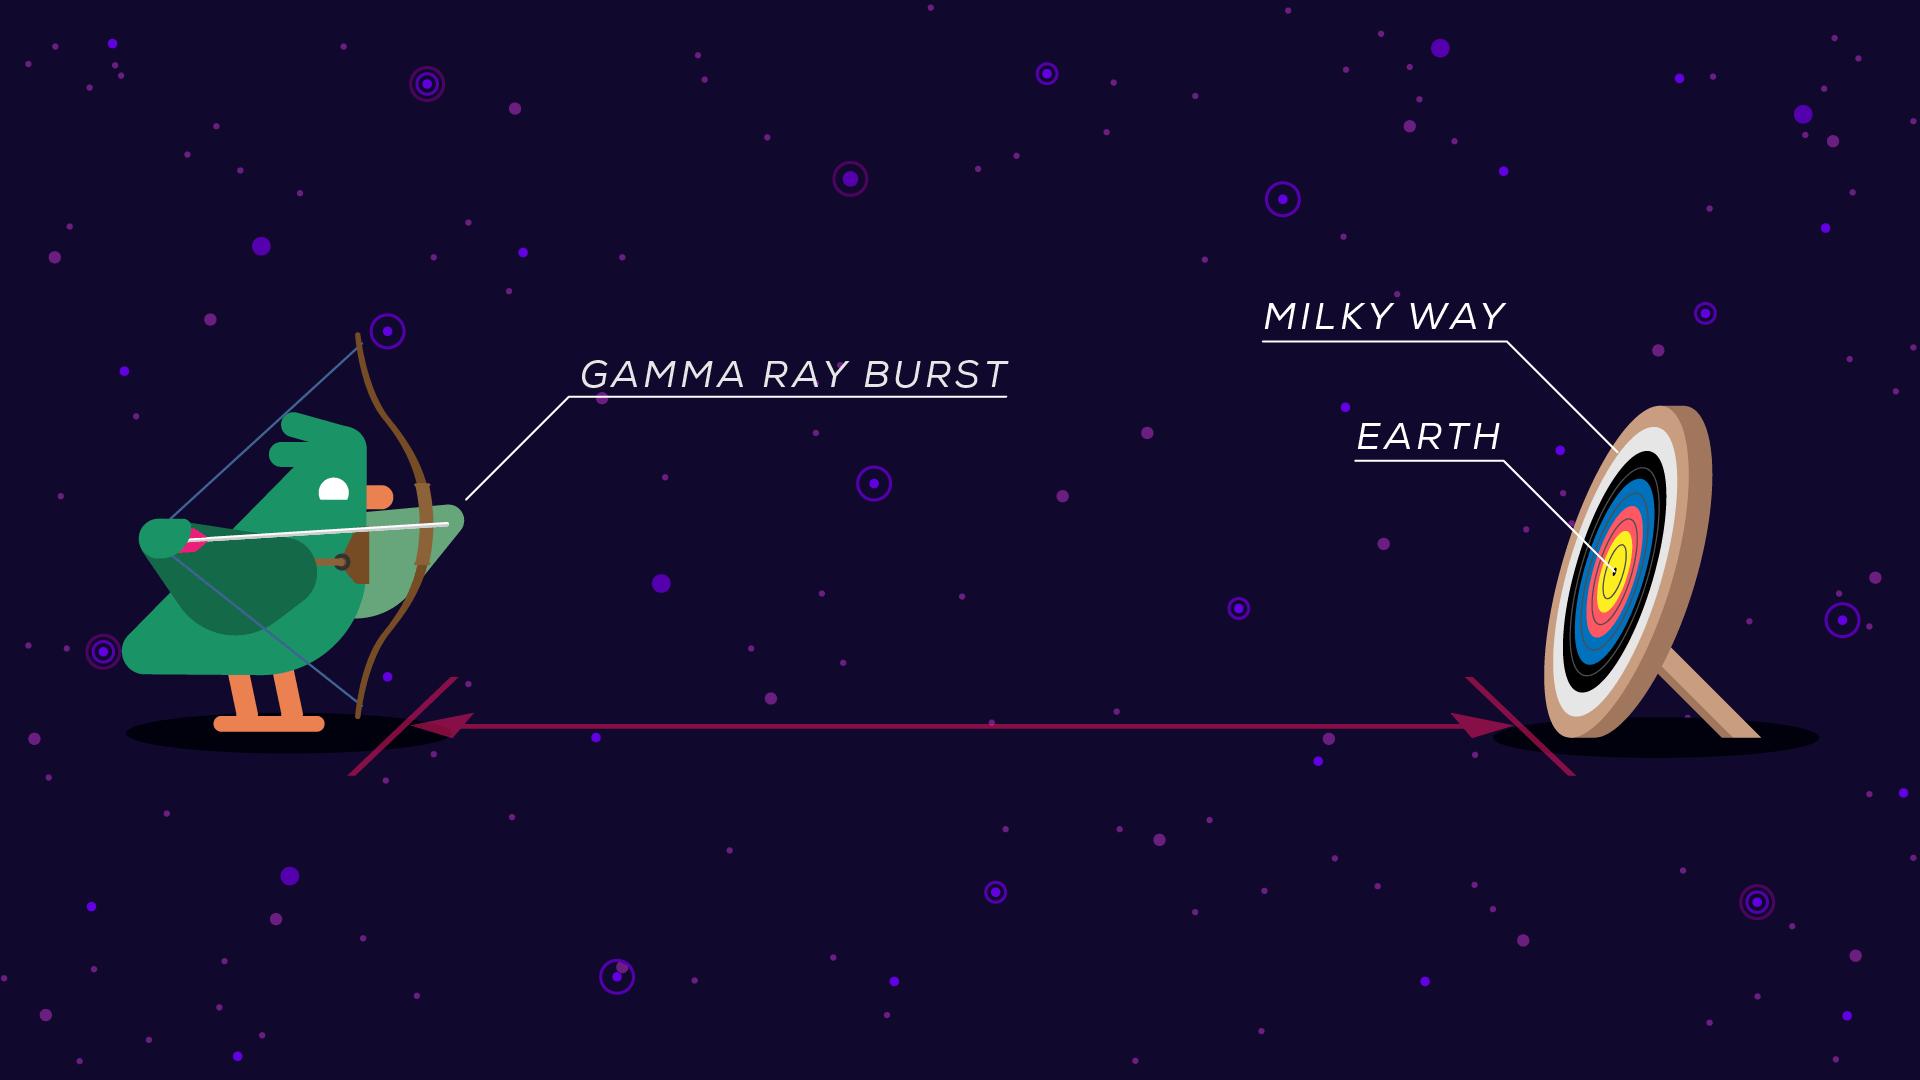 In A Nutshell Kurzgesagt Death From Space